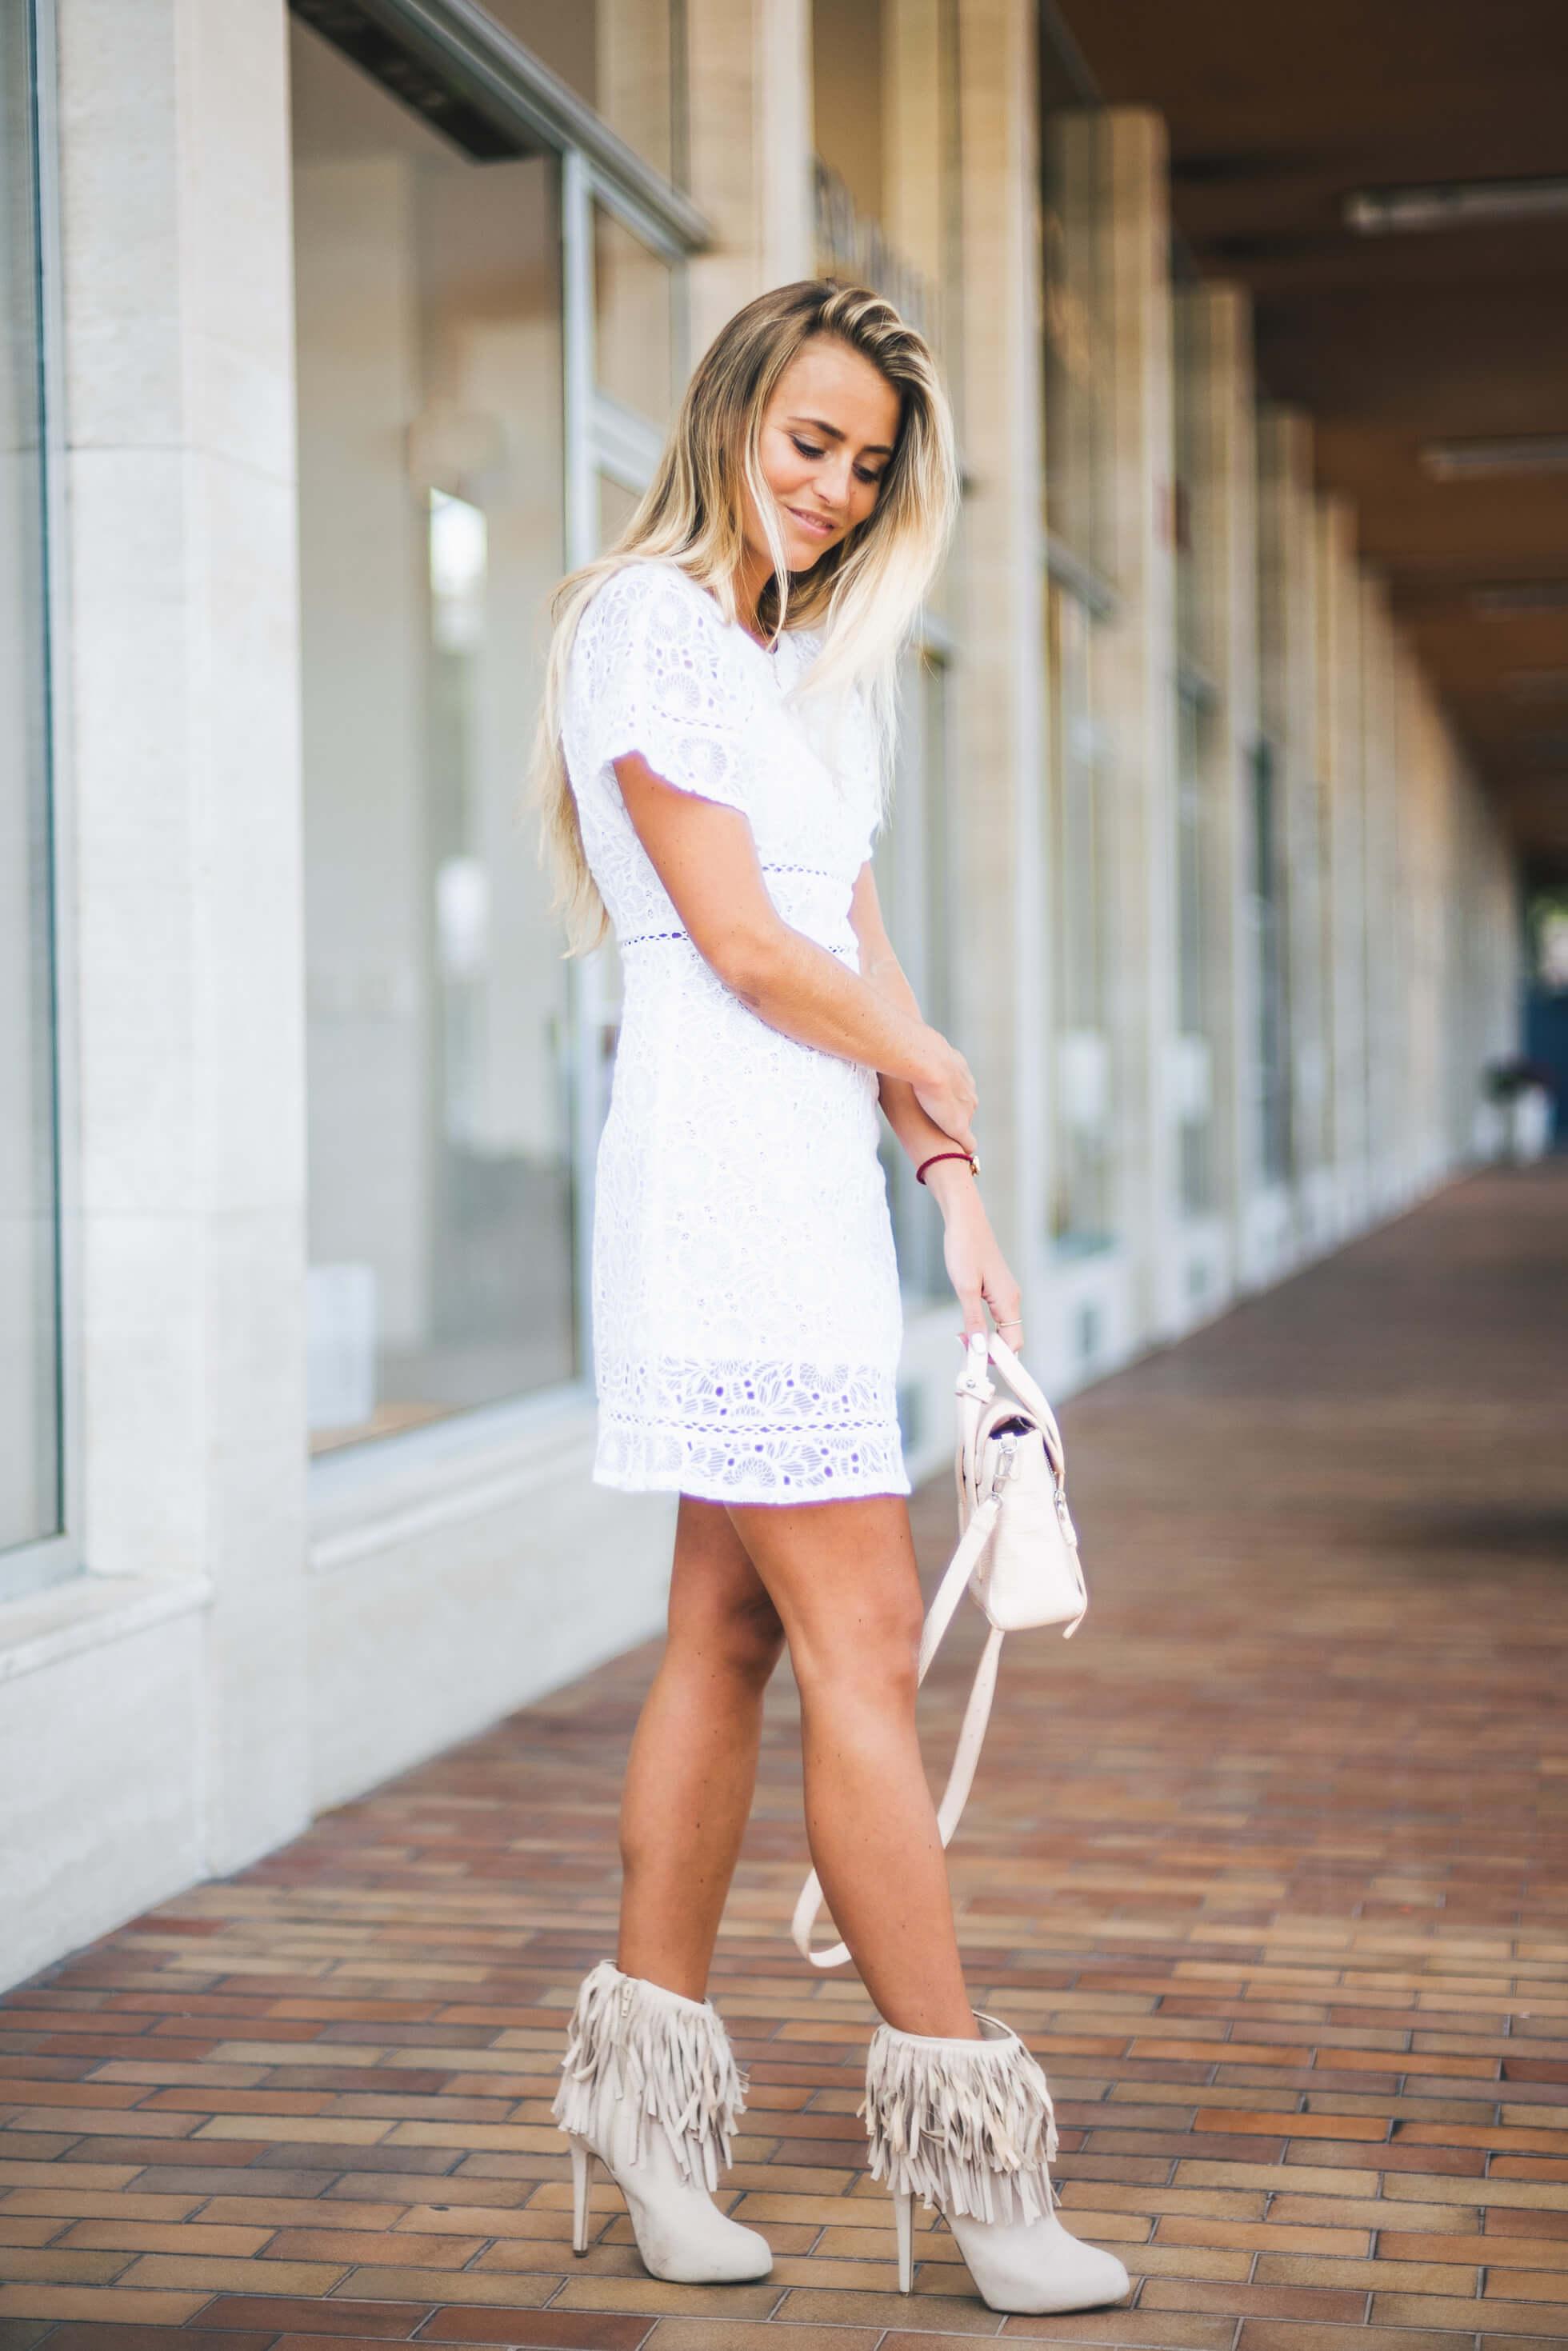 janni-deler-white-lace-dress-storetsJ1040095-Redigera